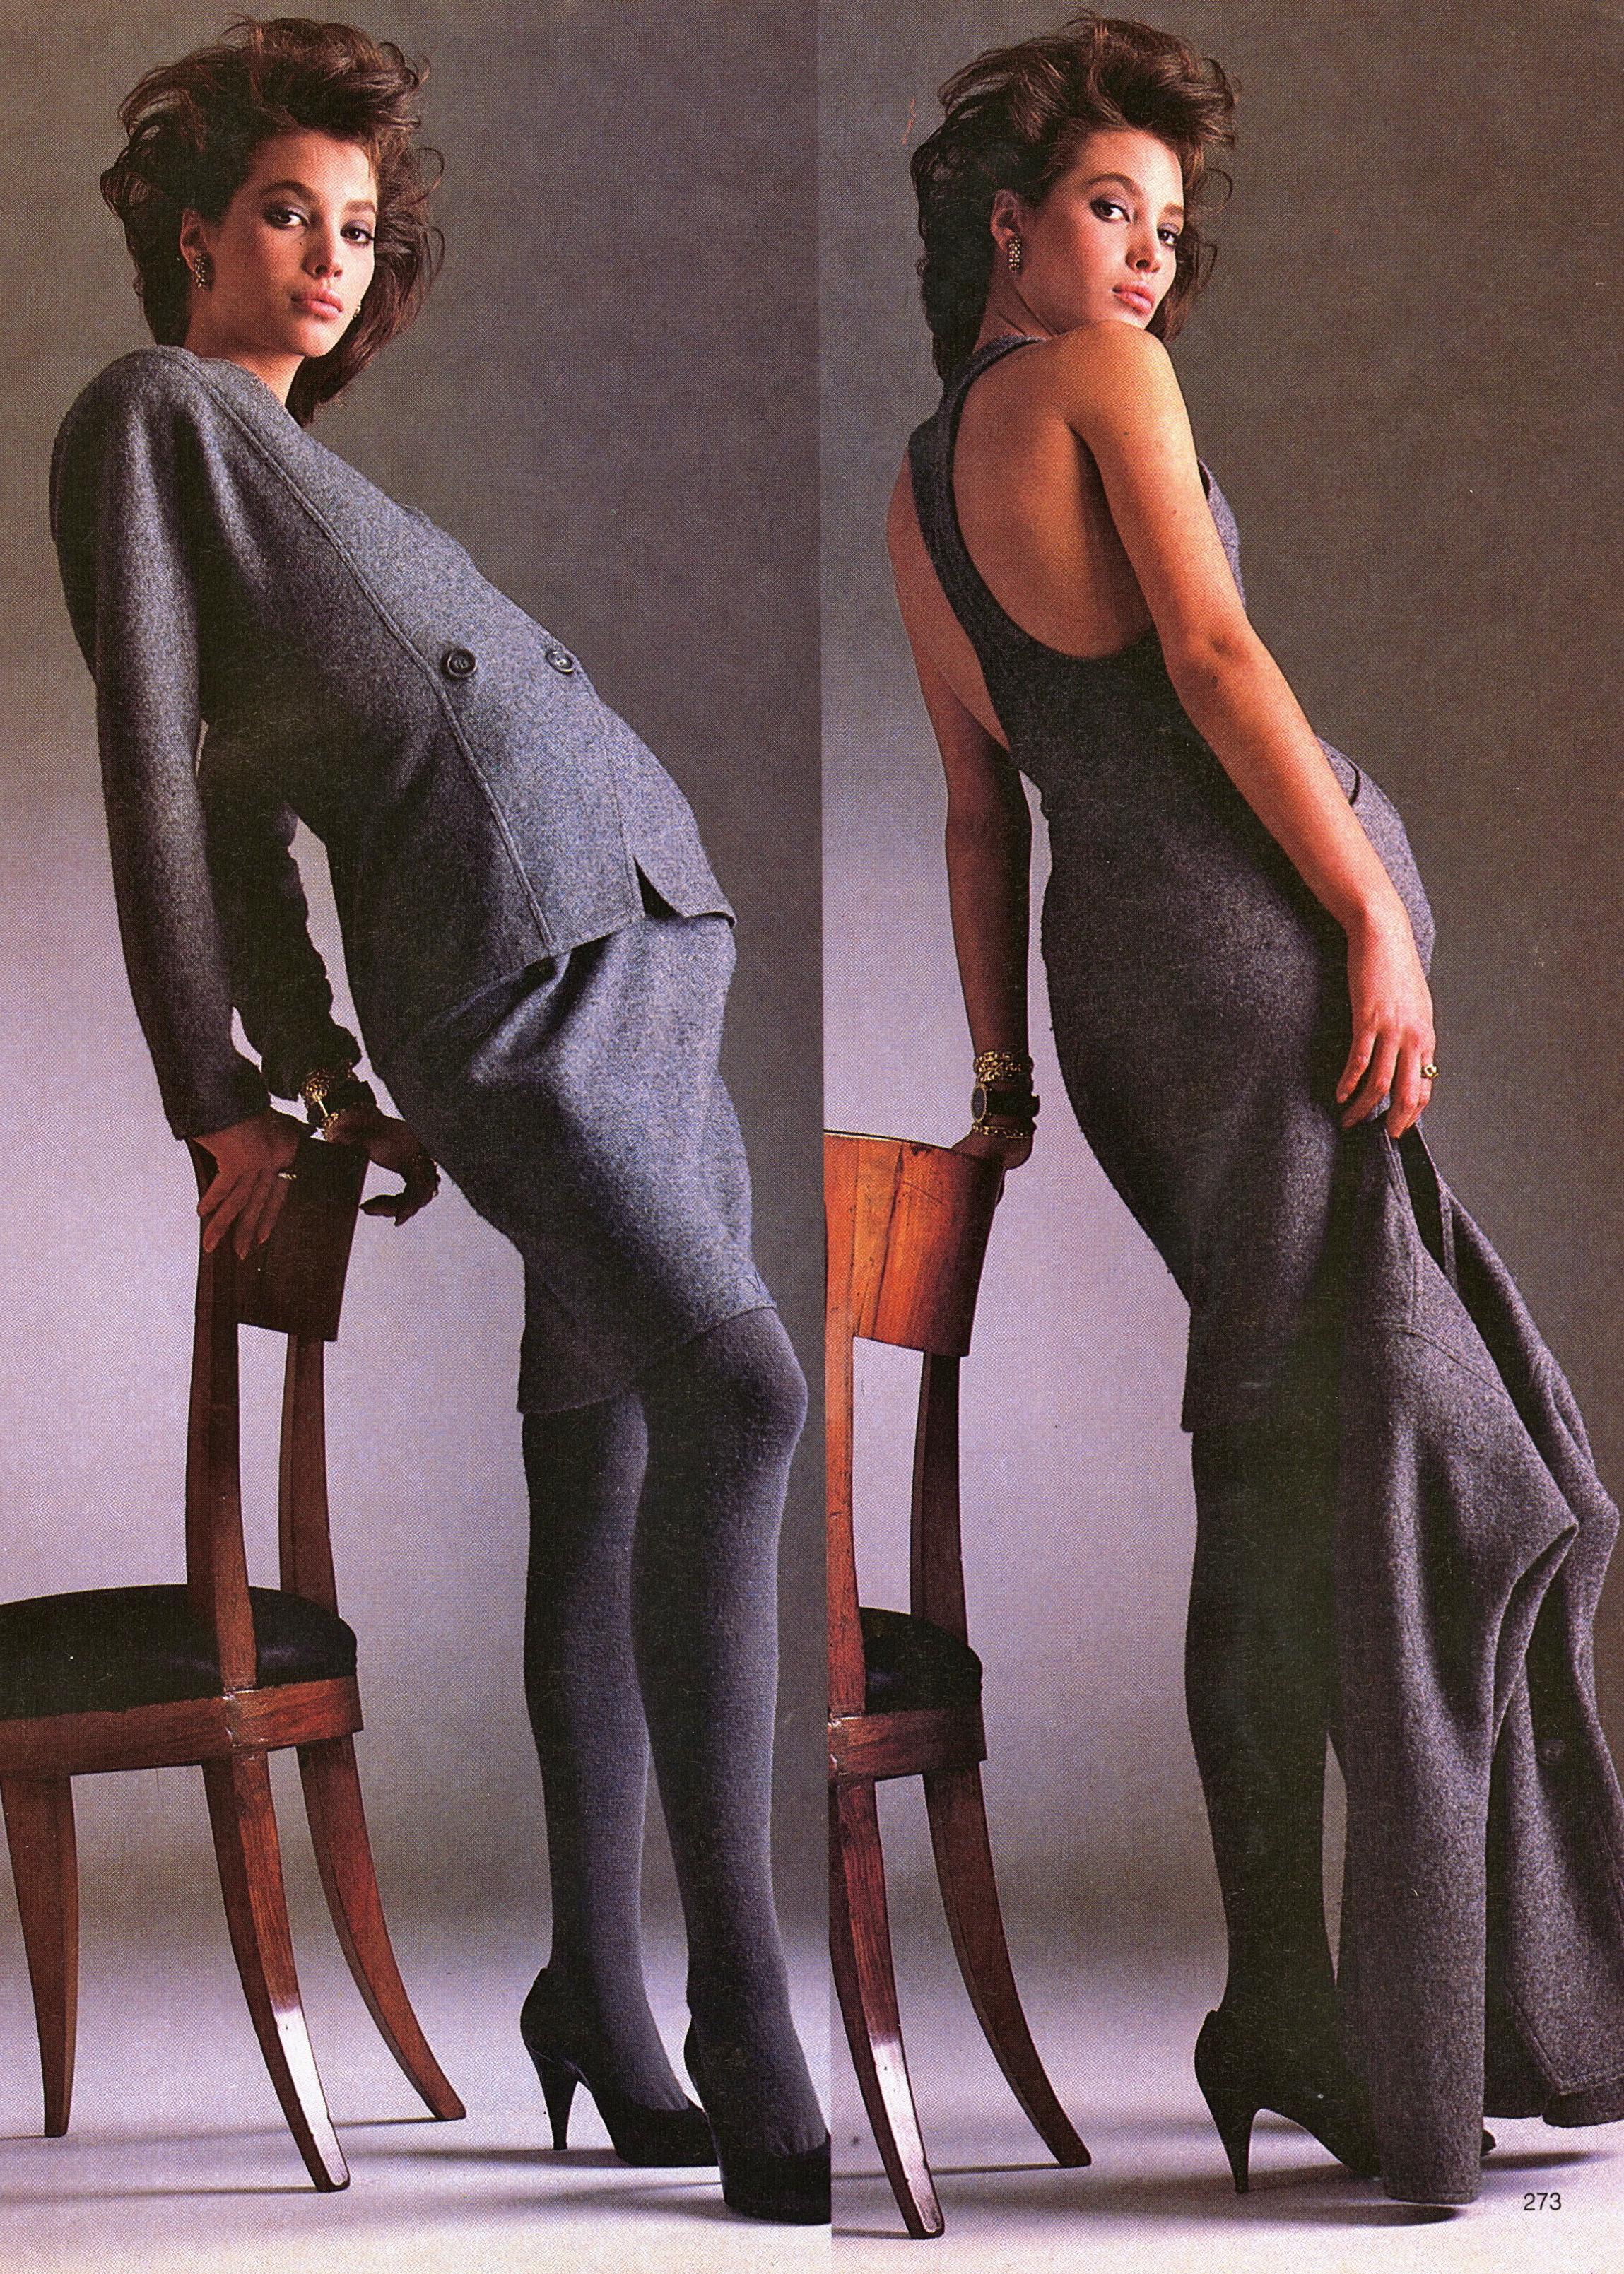 Vogue (US) June 1986 | Christy Turlington & Jose Toledo 02.jpg